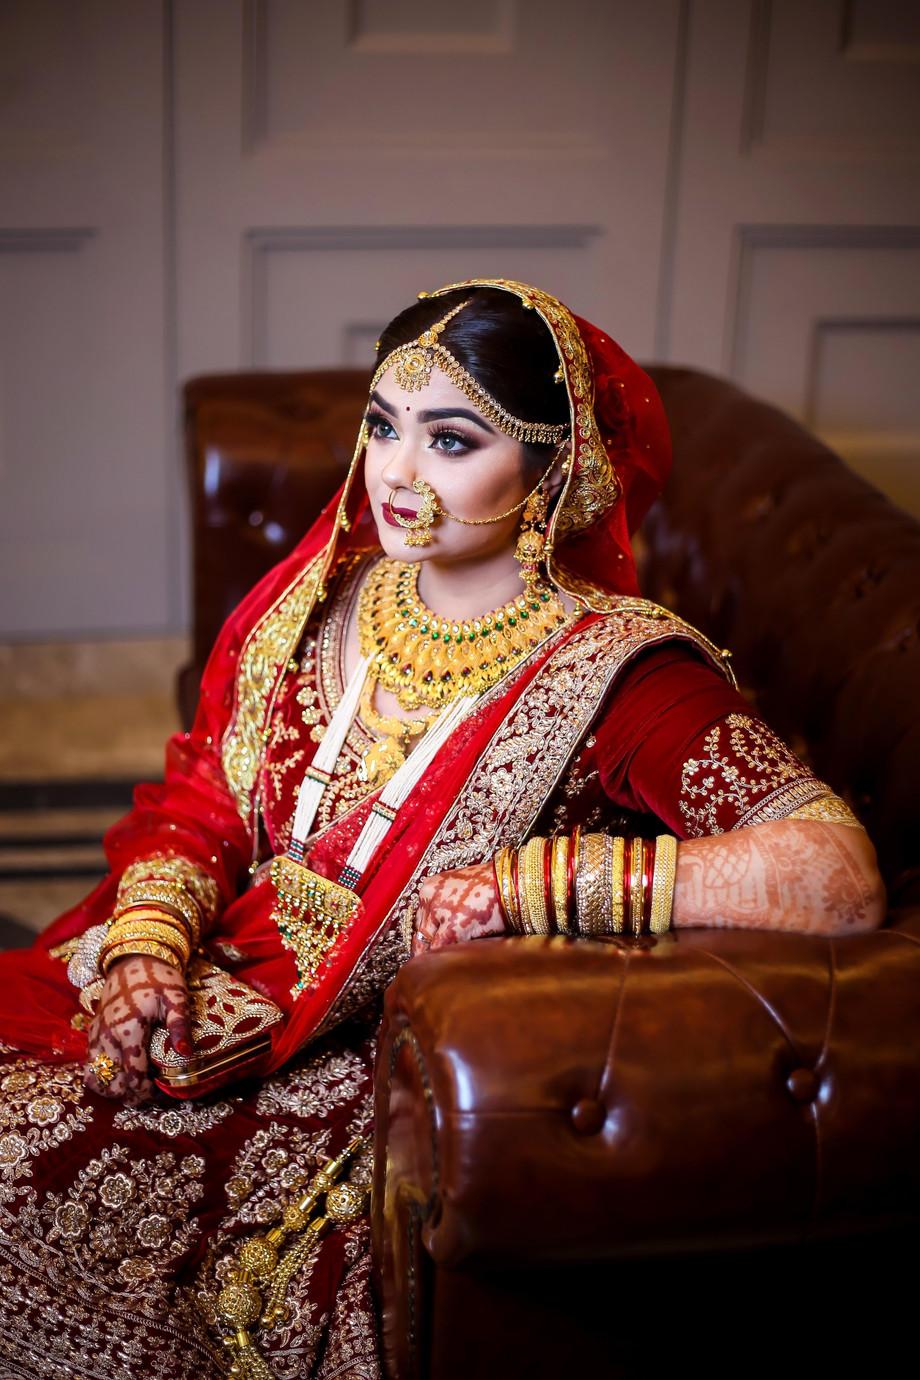 attractive-bangladesh-beautiful-2106685.jpg